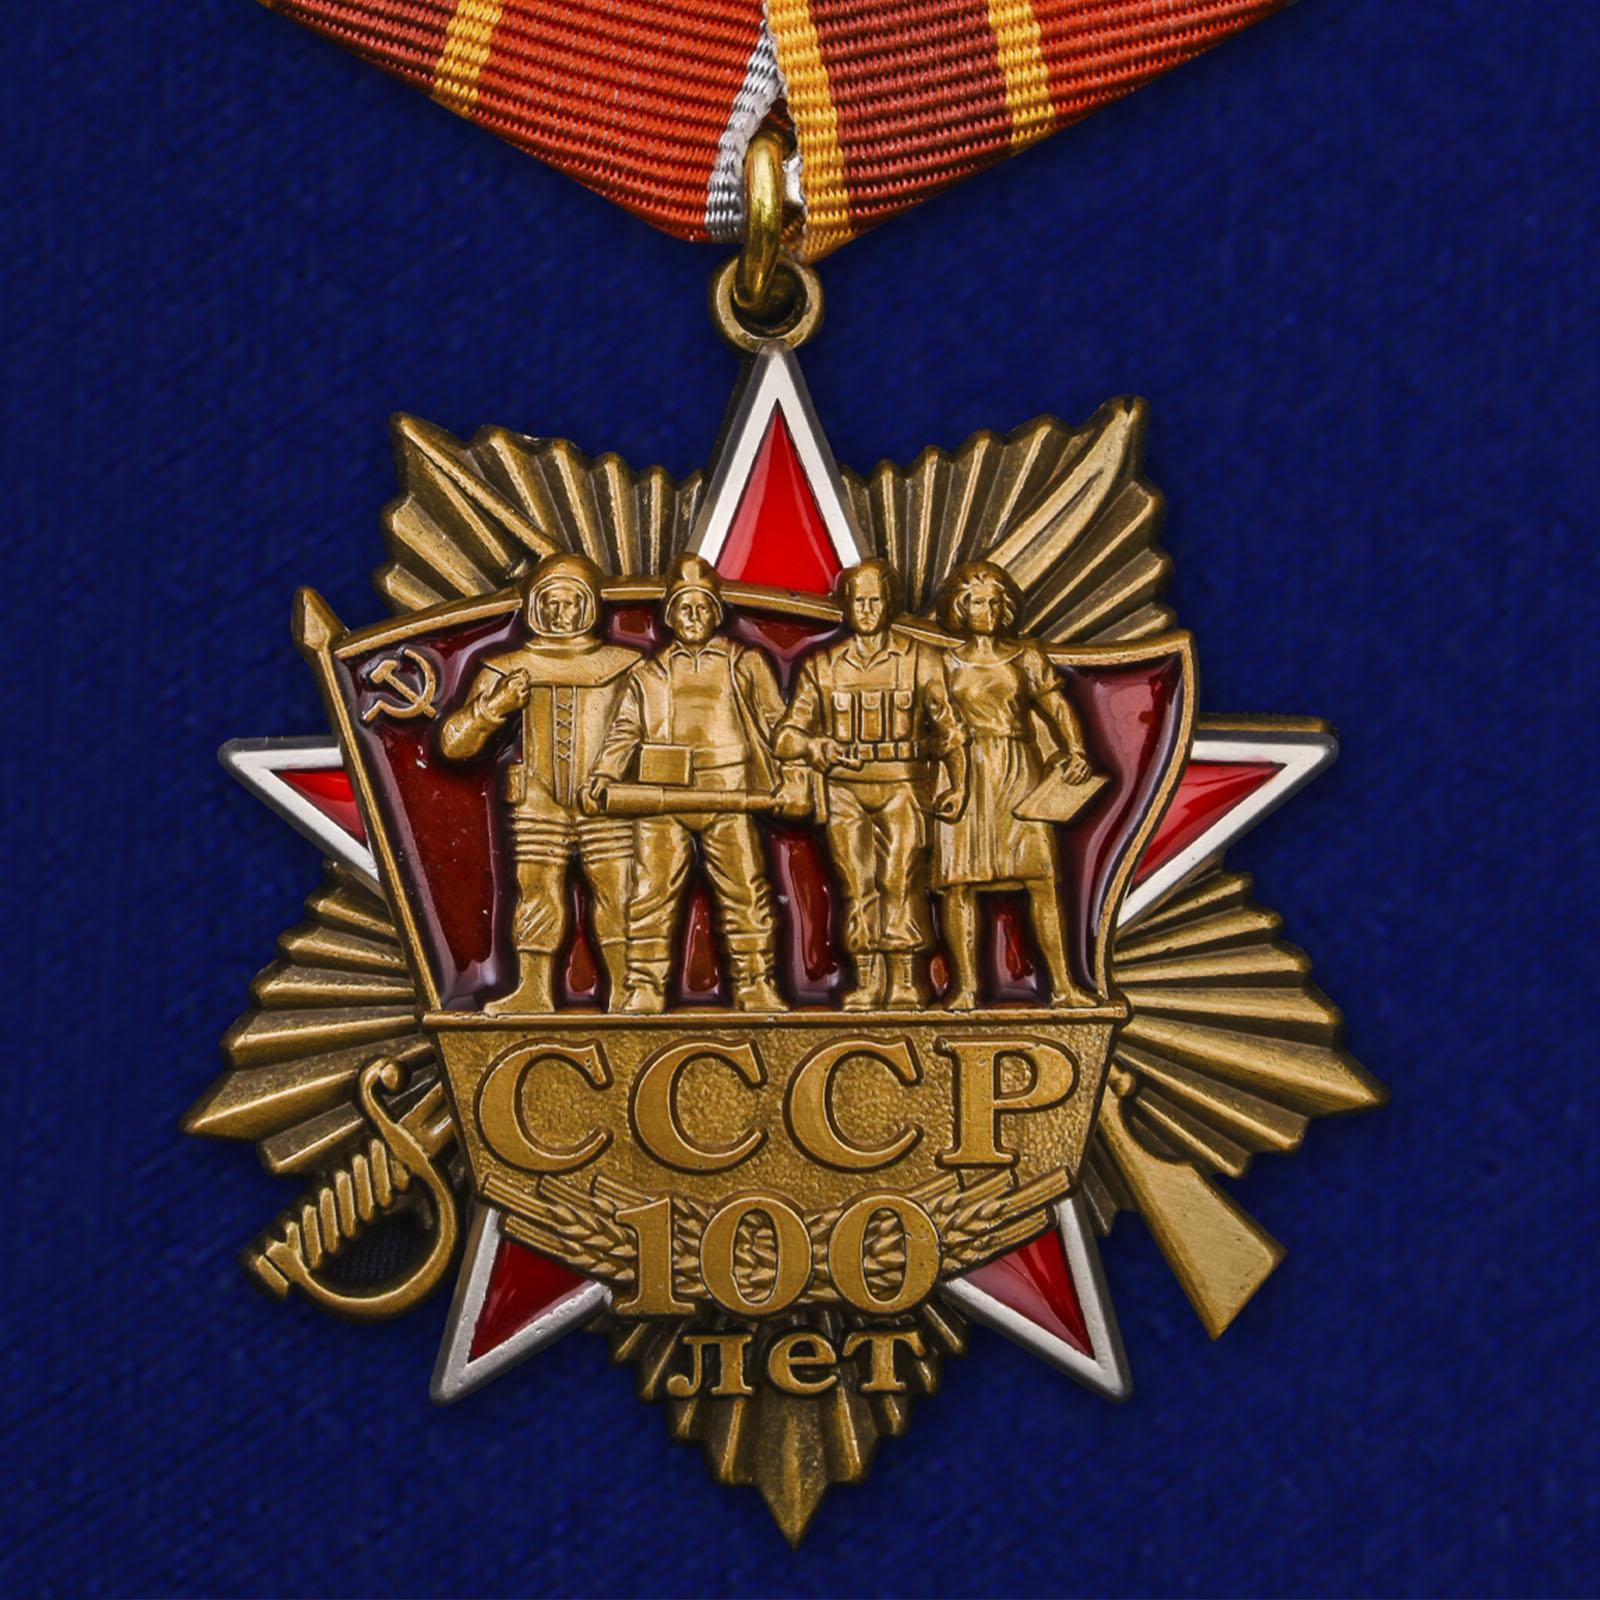 yubilejnyj-orden-100-let-sssr-na-kolodke-021.1600x1600